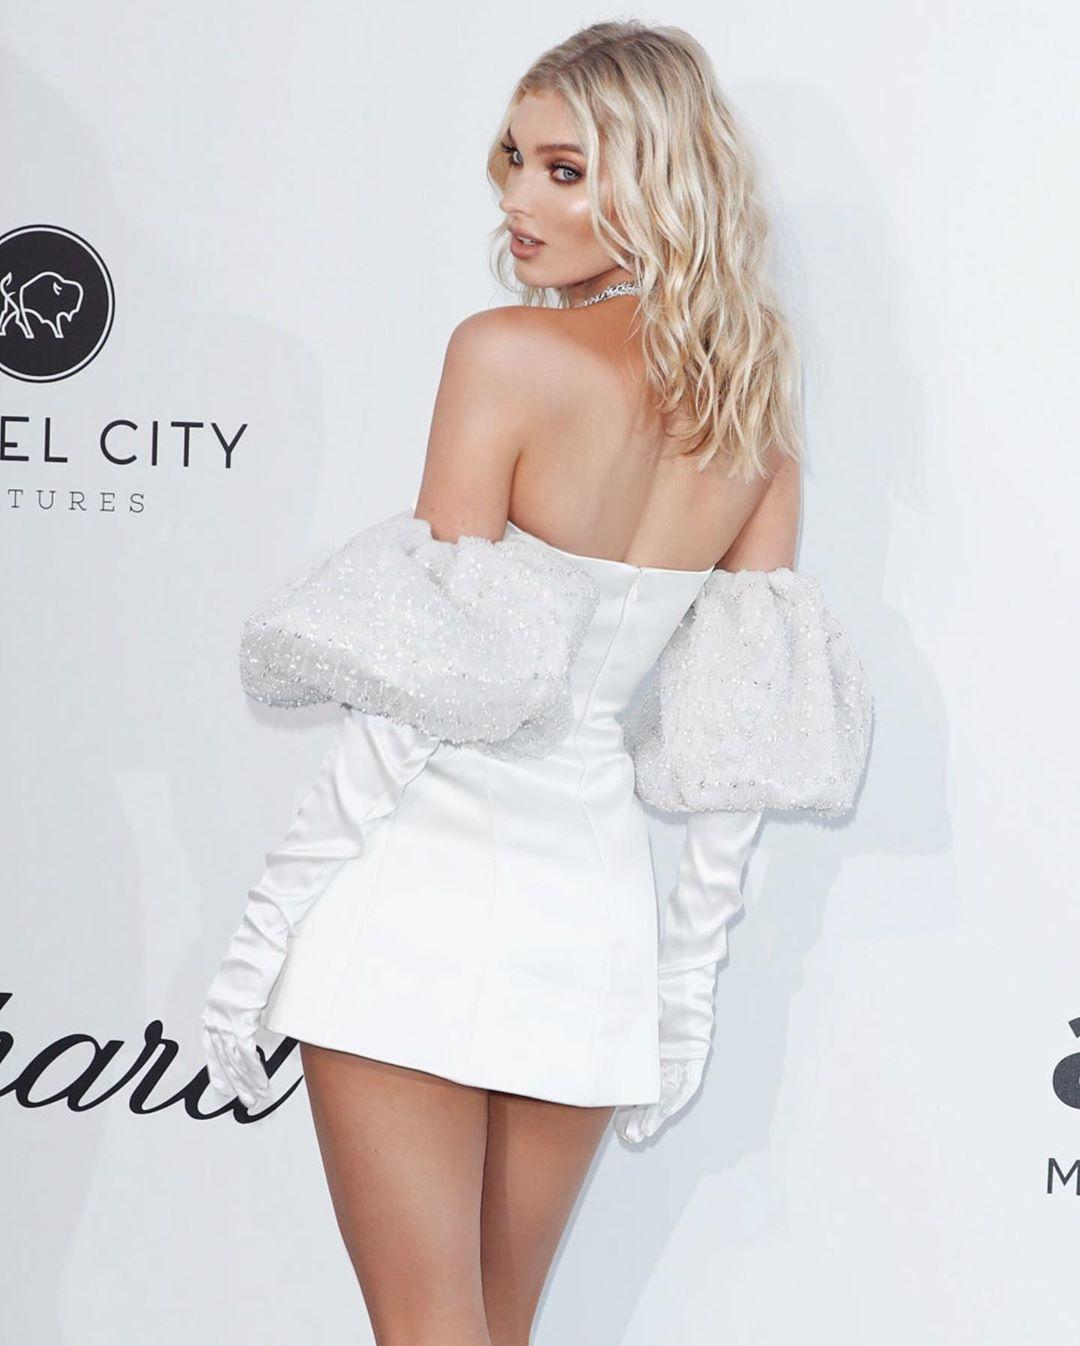 Elsa Hosk Hot